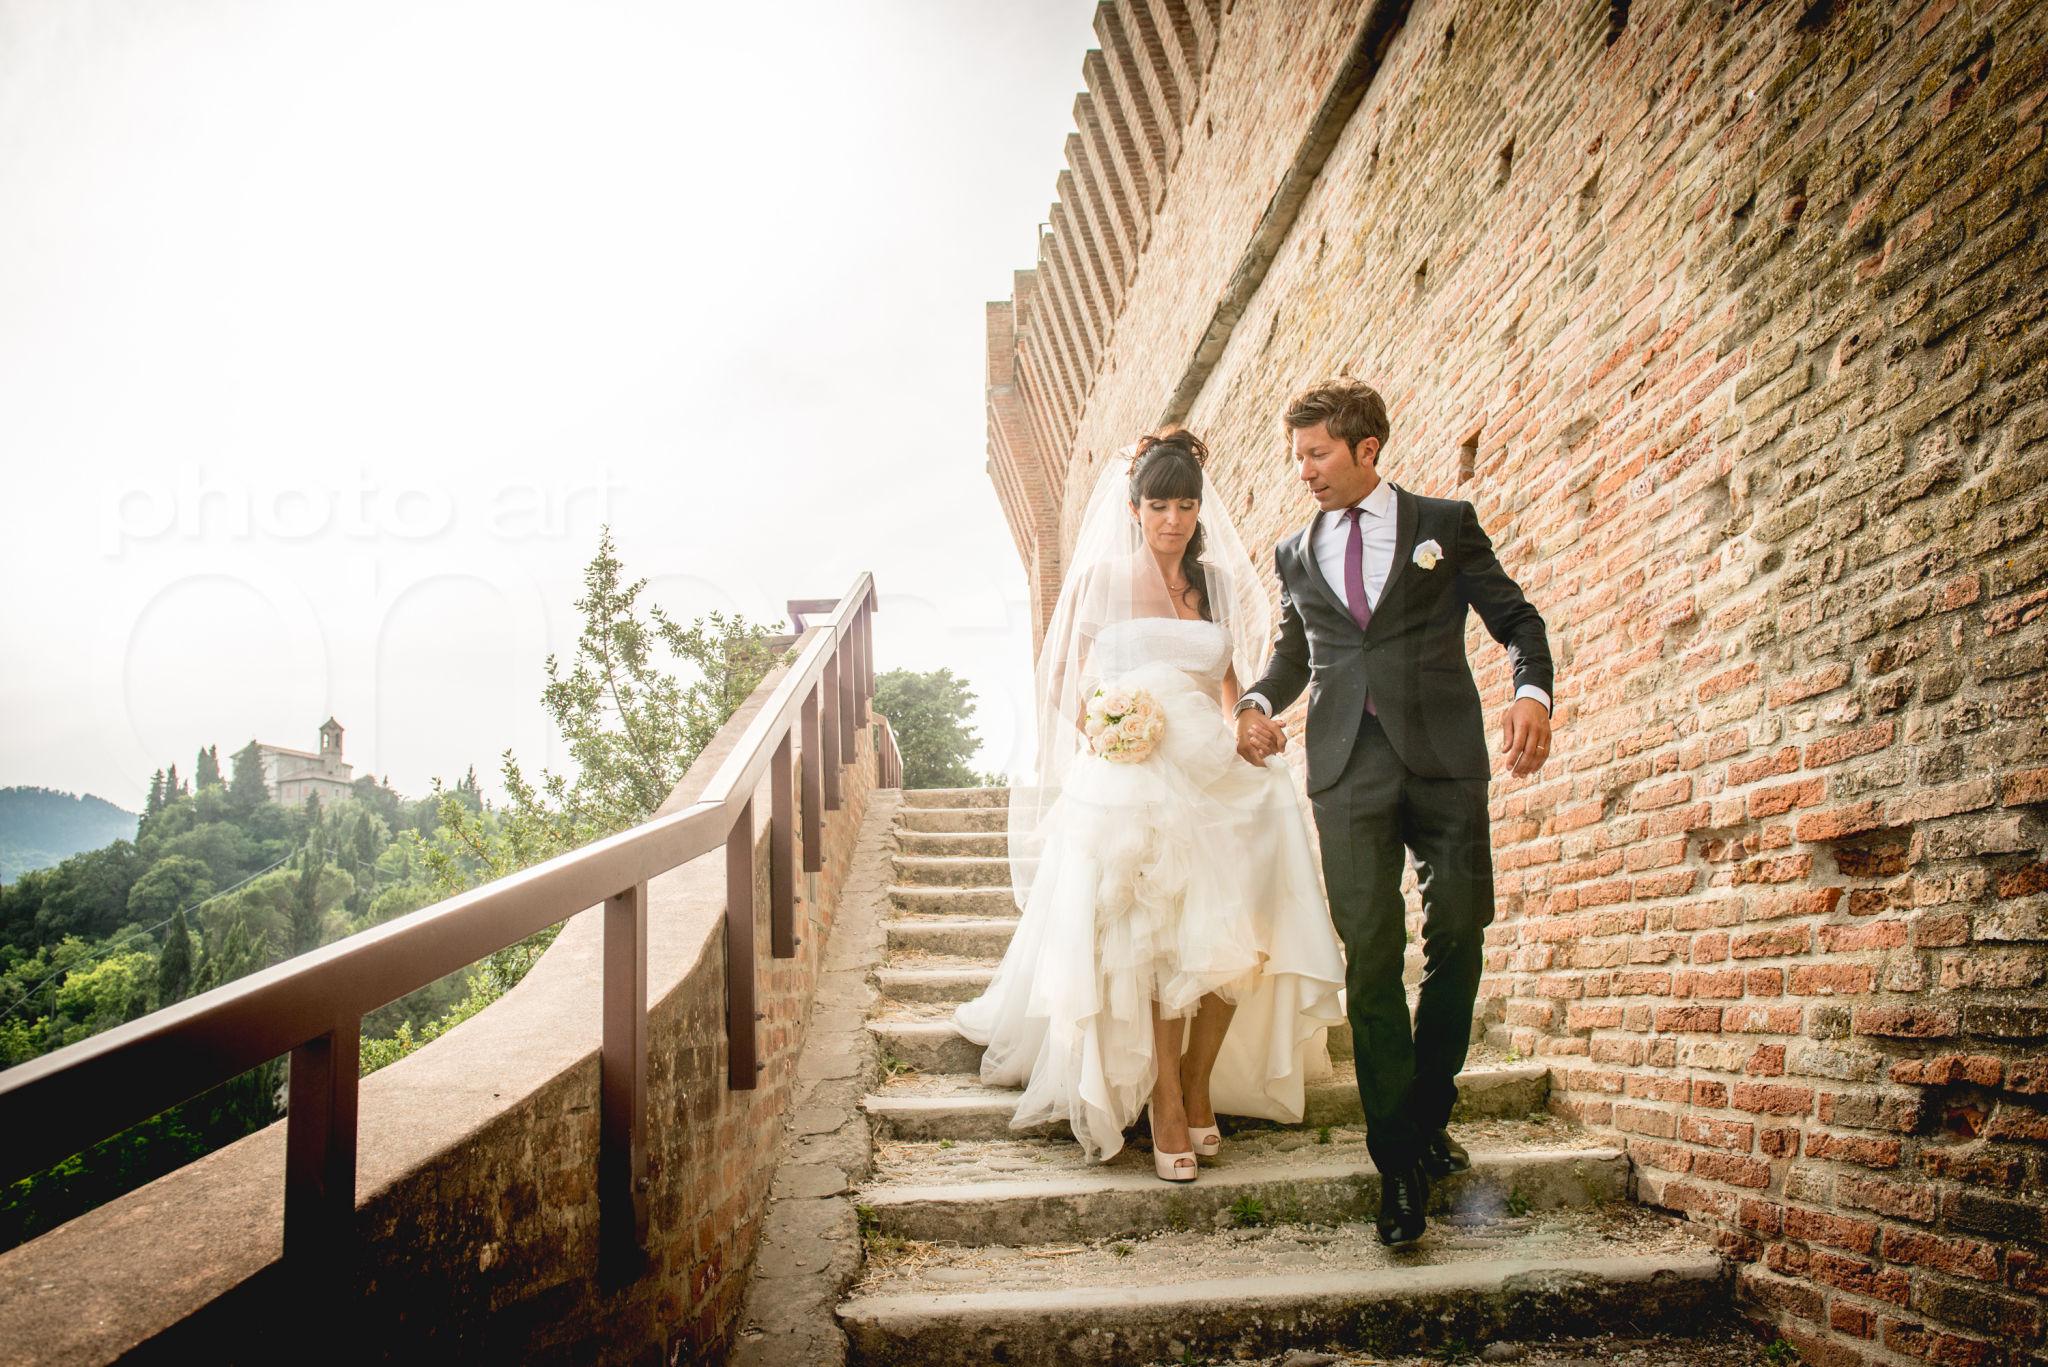 http://lnx.mirkone.it/wp-content/uploads/2015/07/fotografo-matrimoni-faenza-0020.jpg